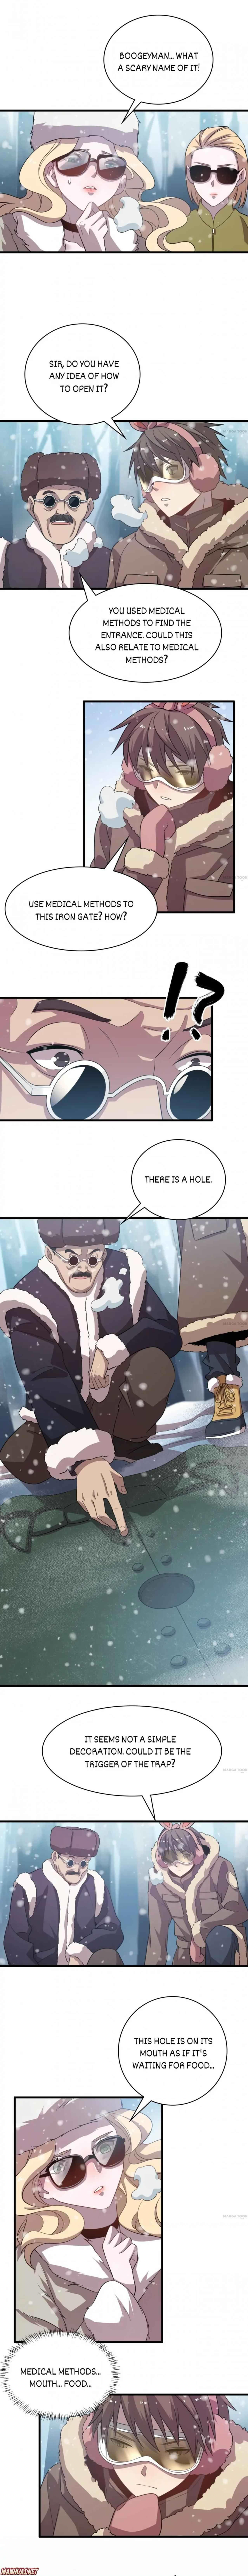 Rebirth Of Legendary Doctor Chapter 74 page 1 - Mangakakalots.com